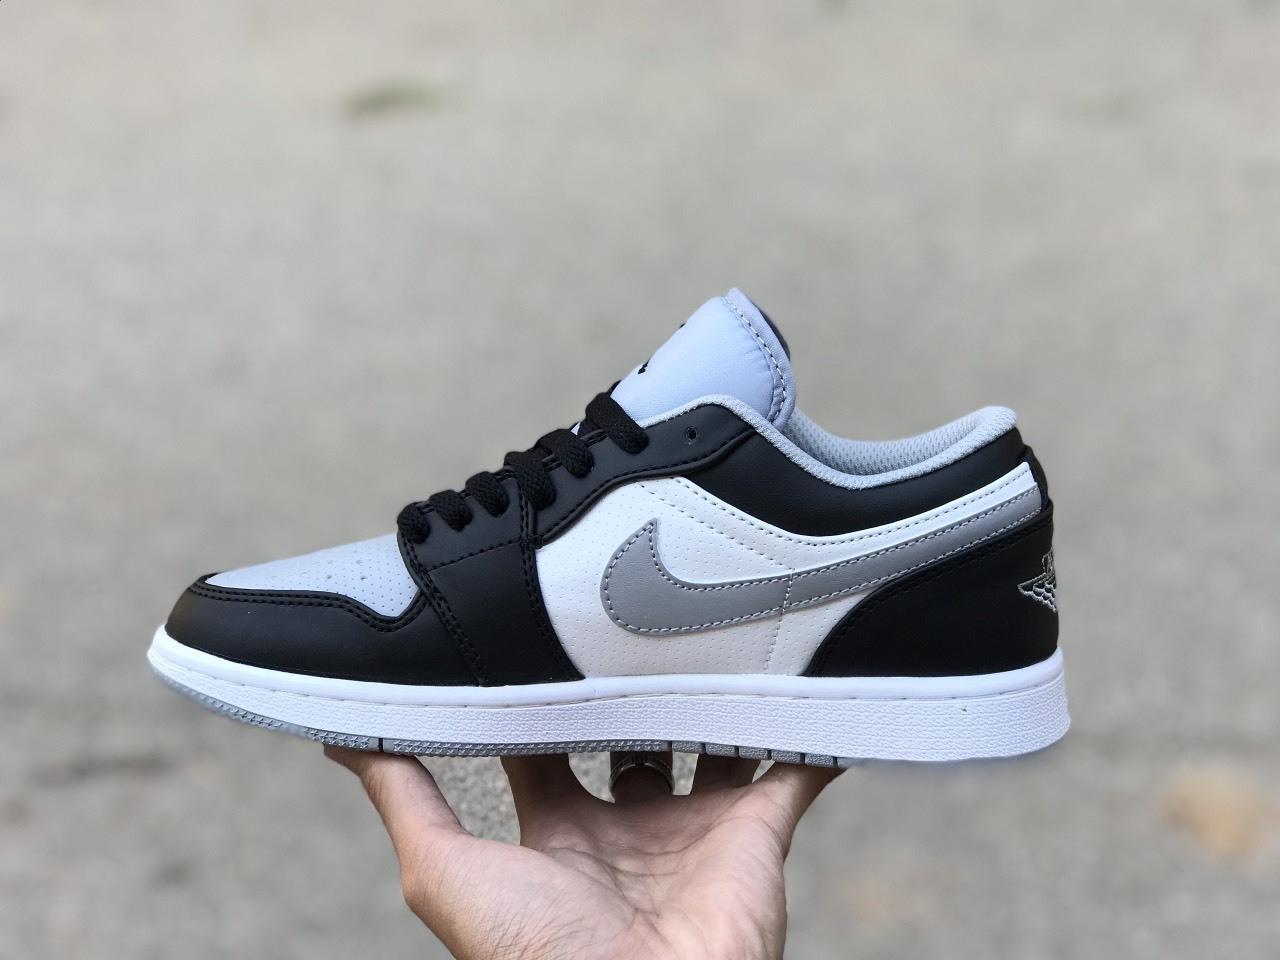 Nike Air Jordan 1 Low Shadow